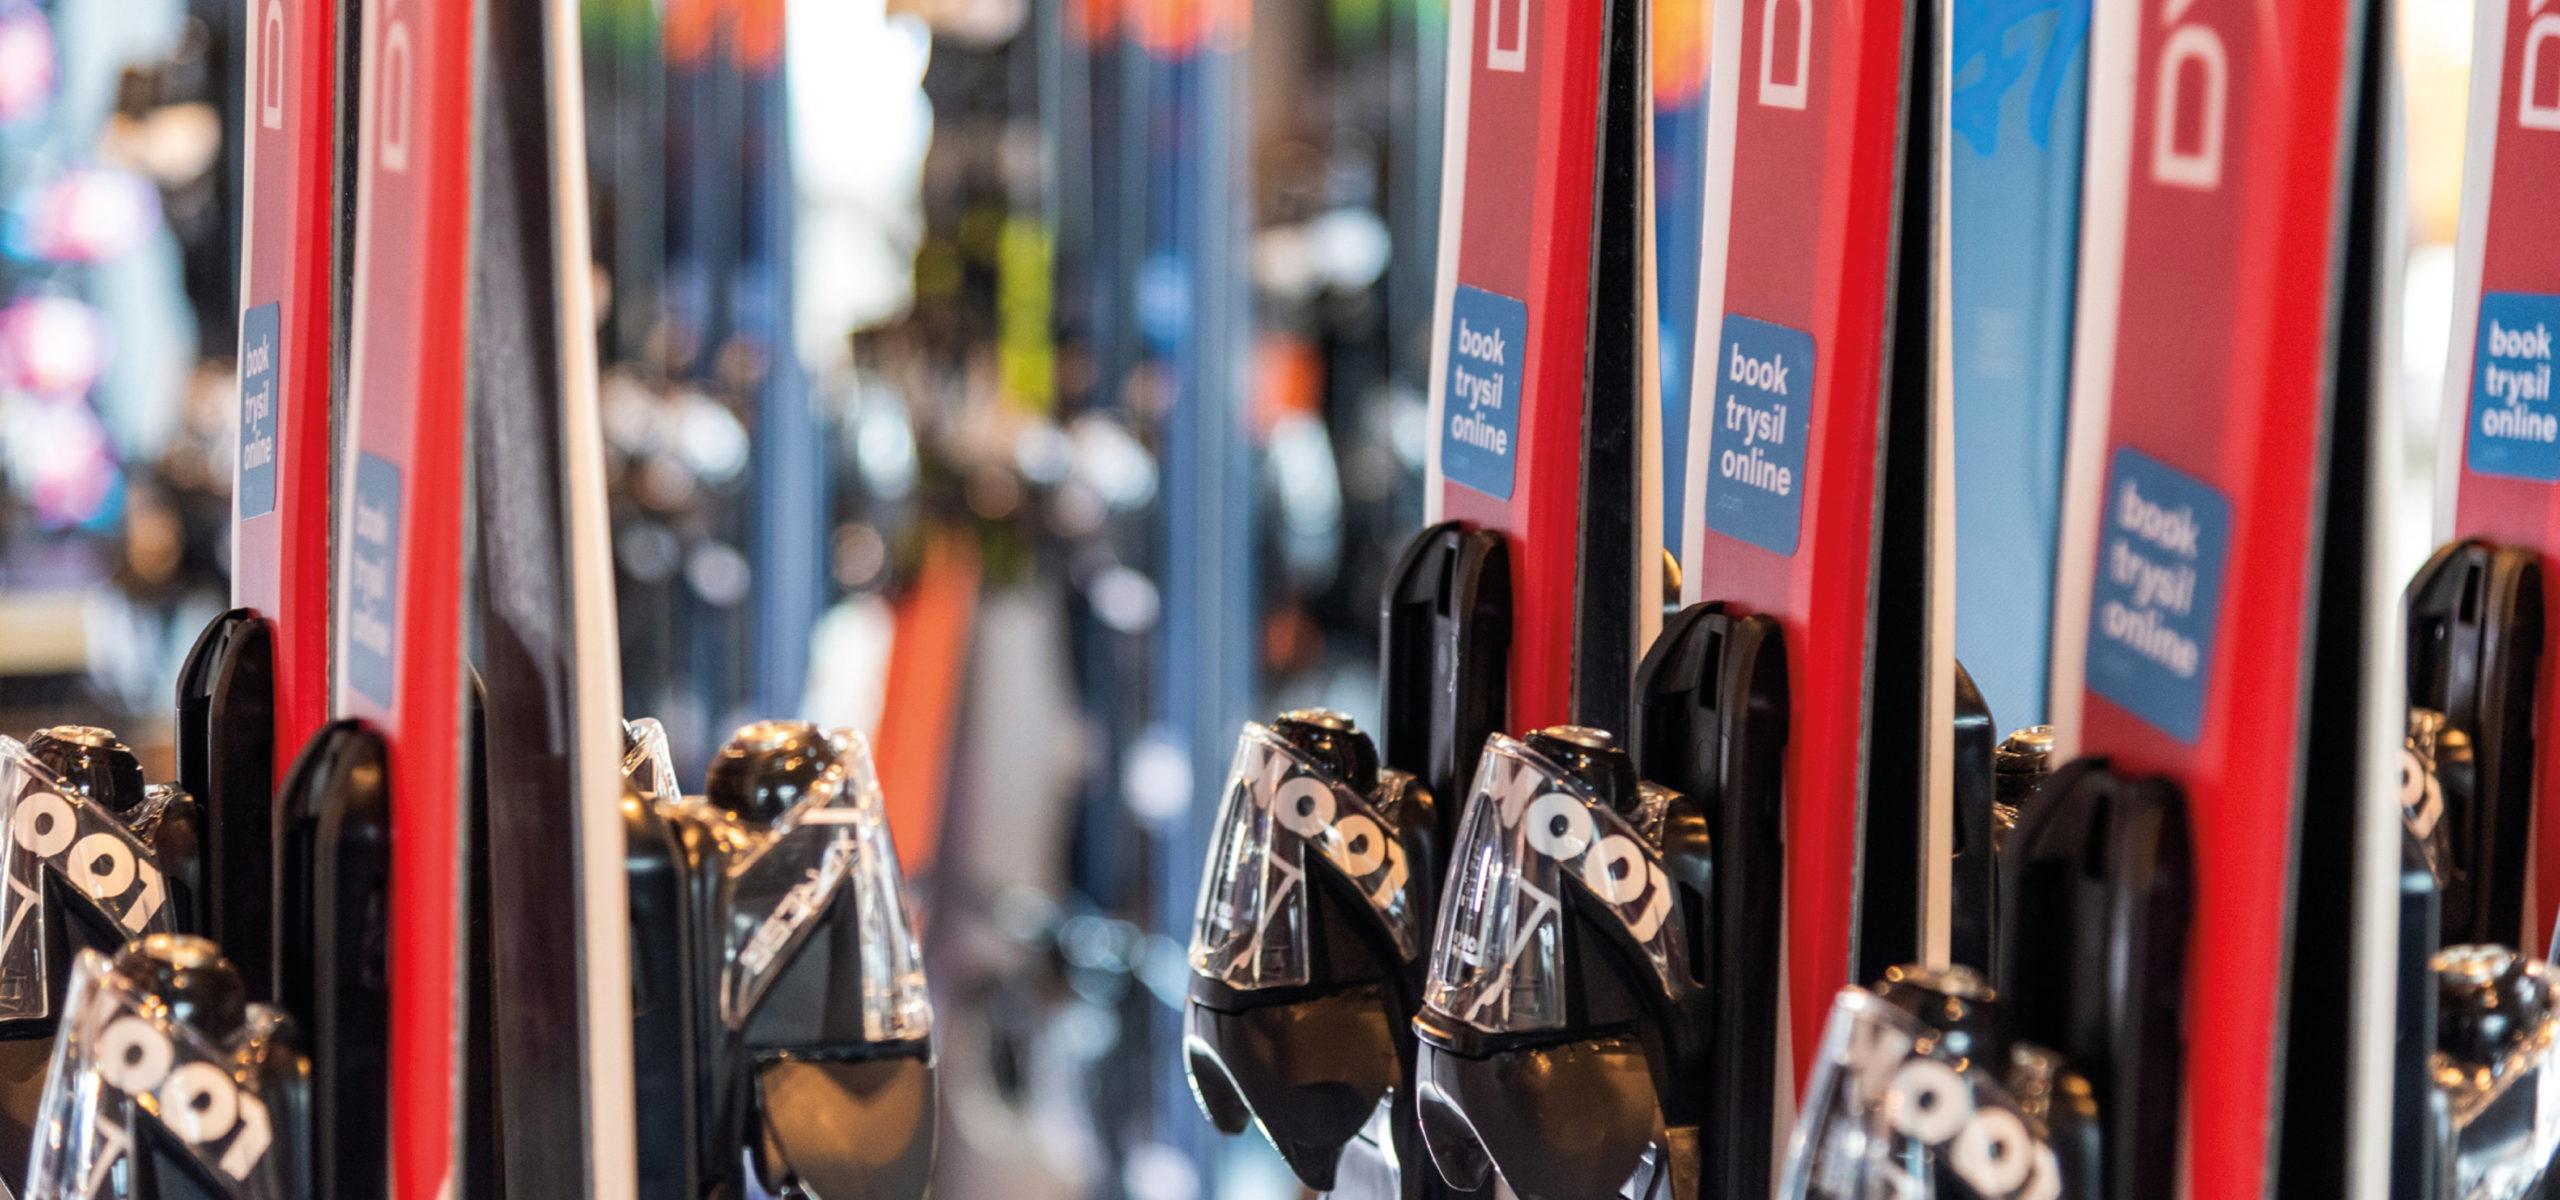 skiutleie/ski rental, online booking,  booktrysilonline på Trysil